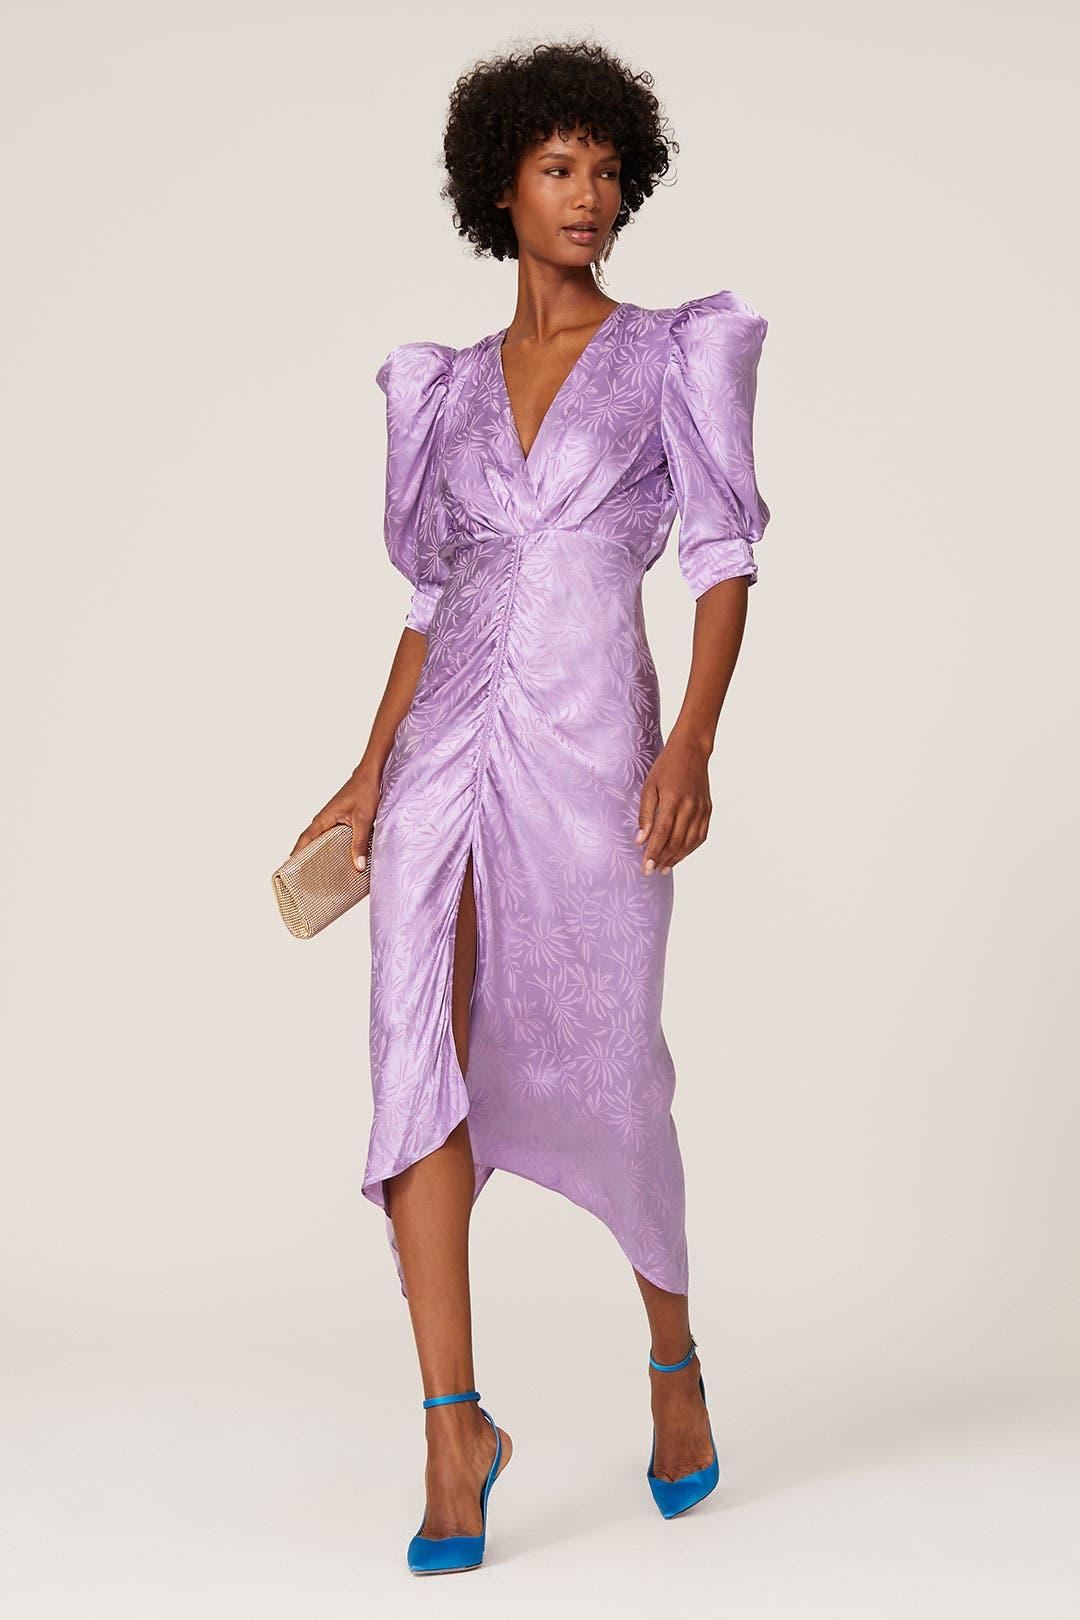 Saratoga Ruffle Sleeve Dress - Envisage-Cromwell